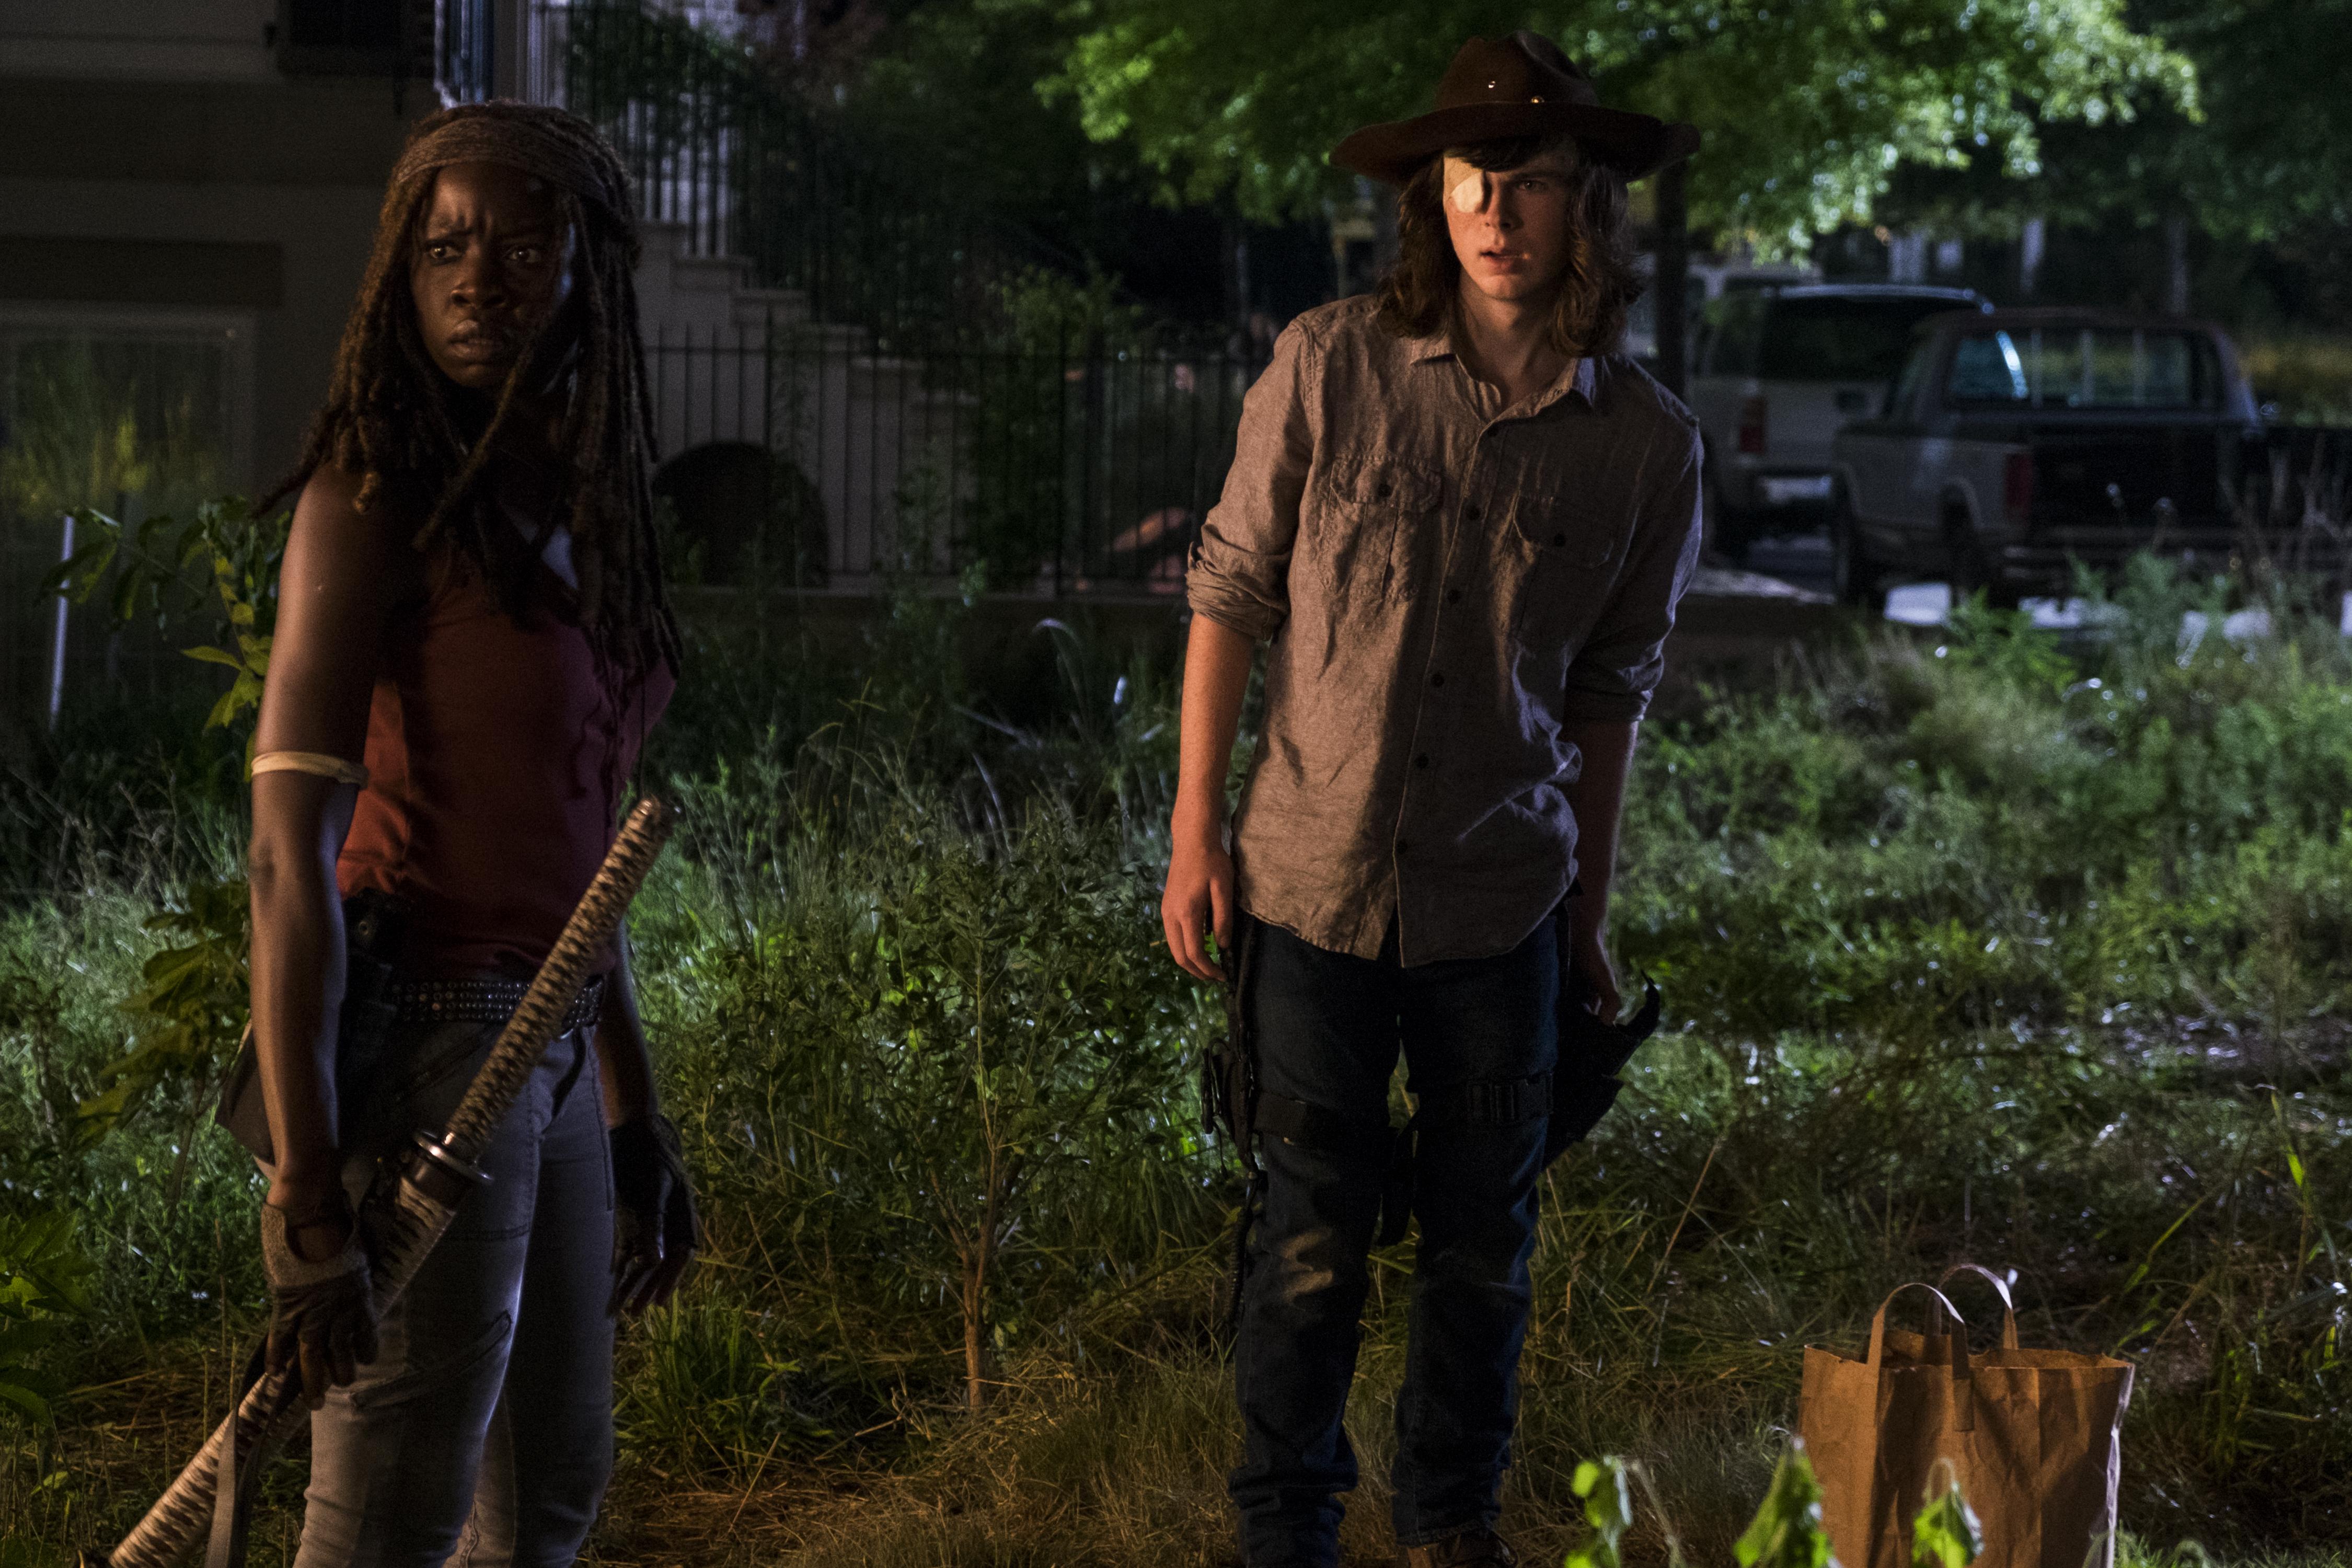 Chandler Riggs as Carl Grimes and Danai Gurira as Michonne in 'The Walking Dead' Season 8, Episode 8.